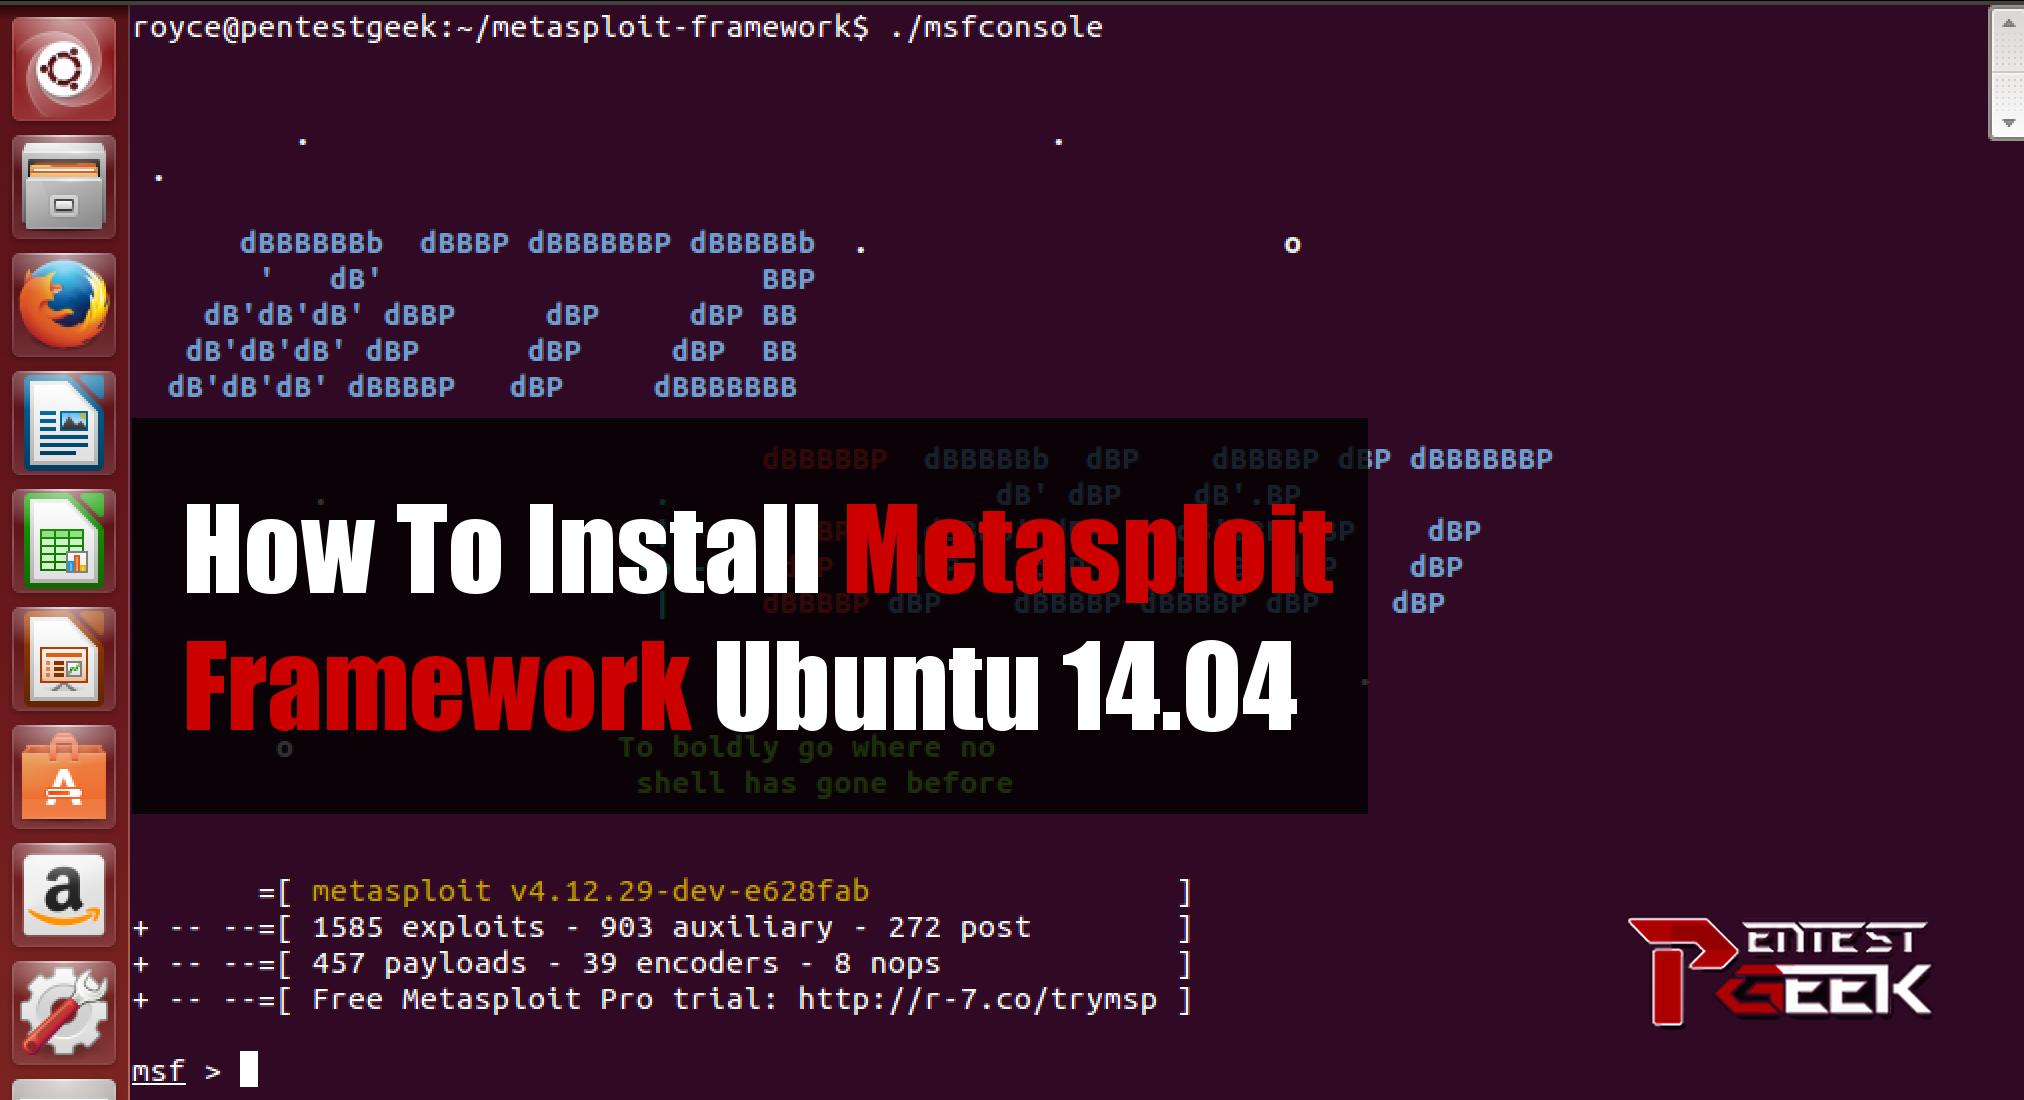 5c4ee528355c92135afe05cc7ee7c6e3 - Best Vpn For Ubuntu 18.04